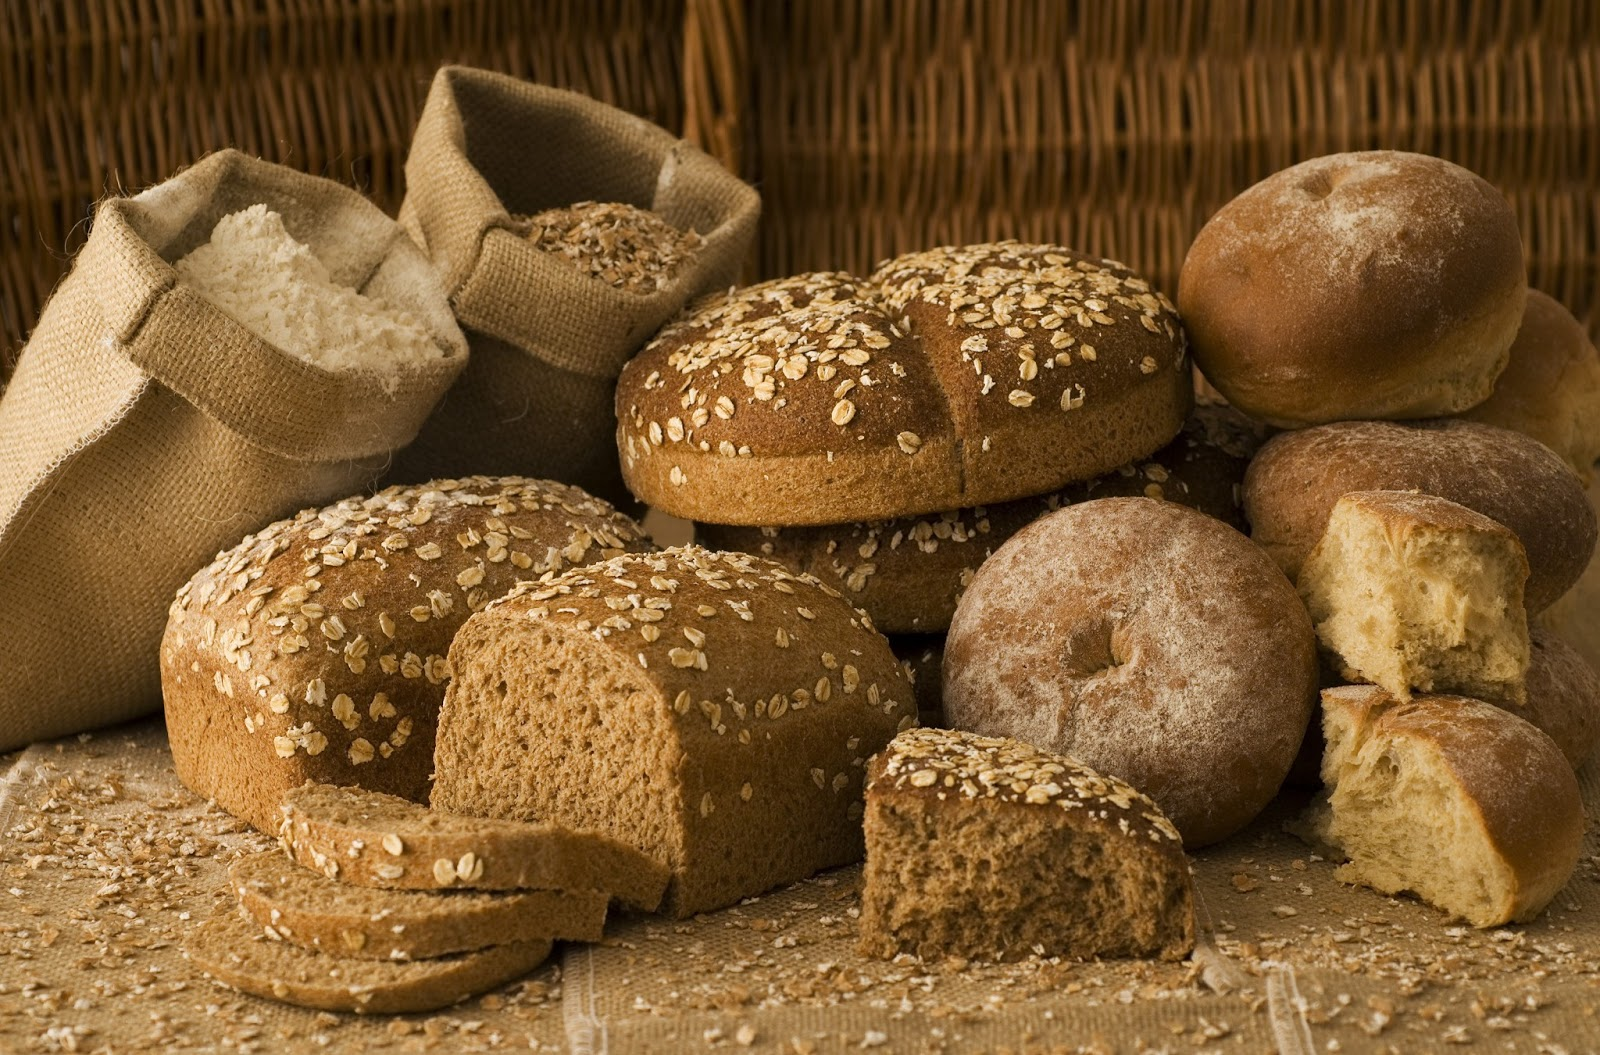 Картинка с хлебом